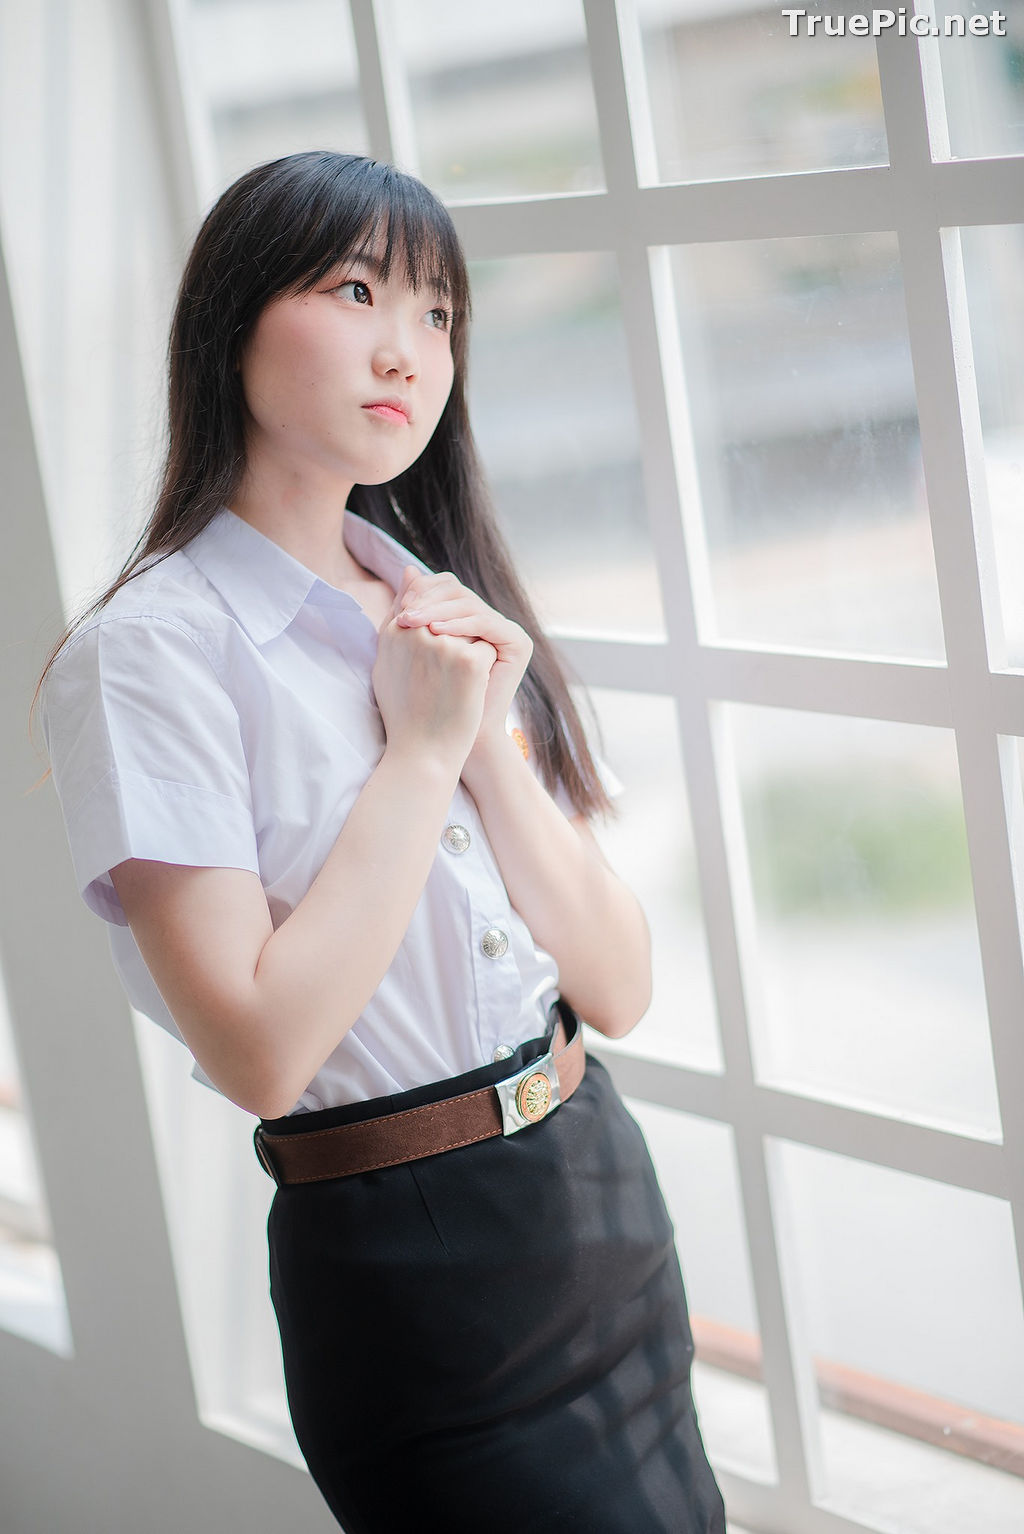 Image Thailand Model - Miki Ariyathanakit - Cute Student Girl - TruePic.net - Picture-4